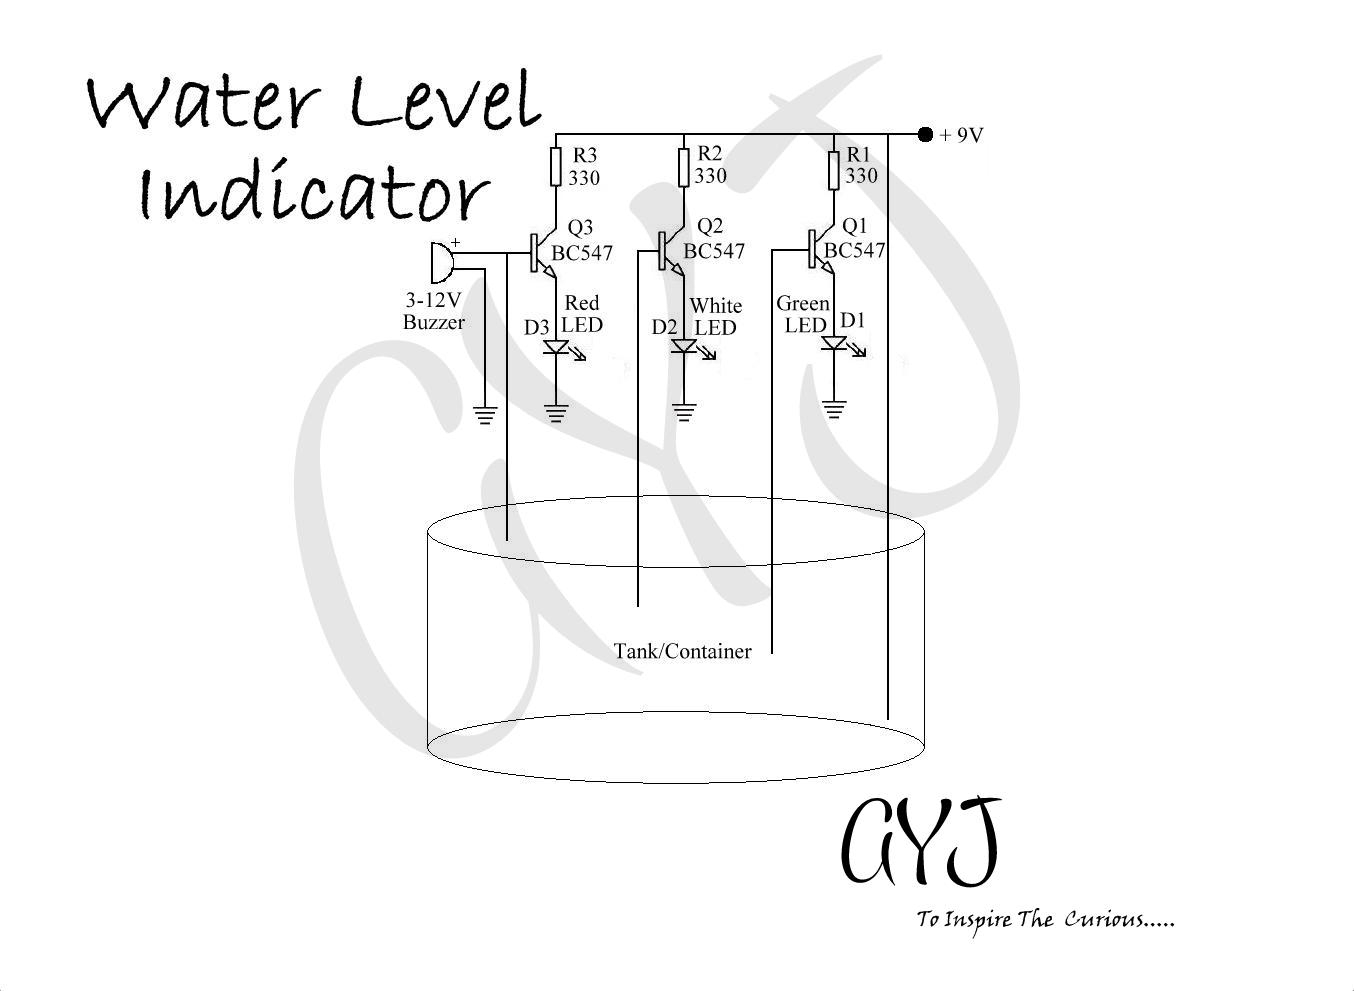 Water Level Indicator Circuit Diagram